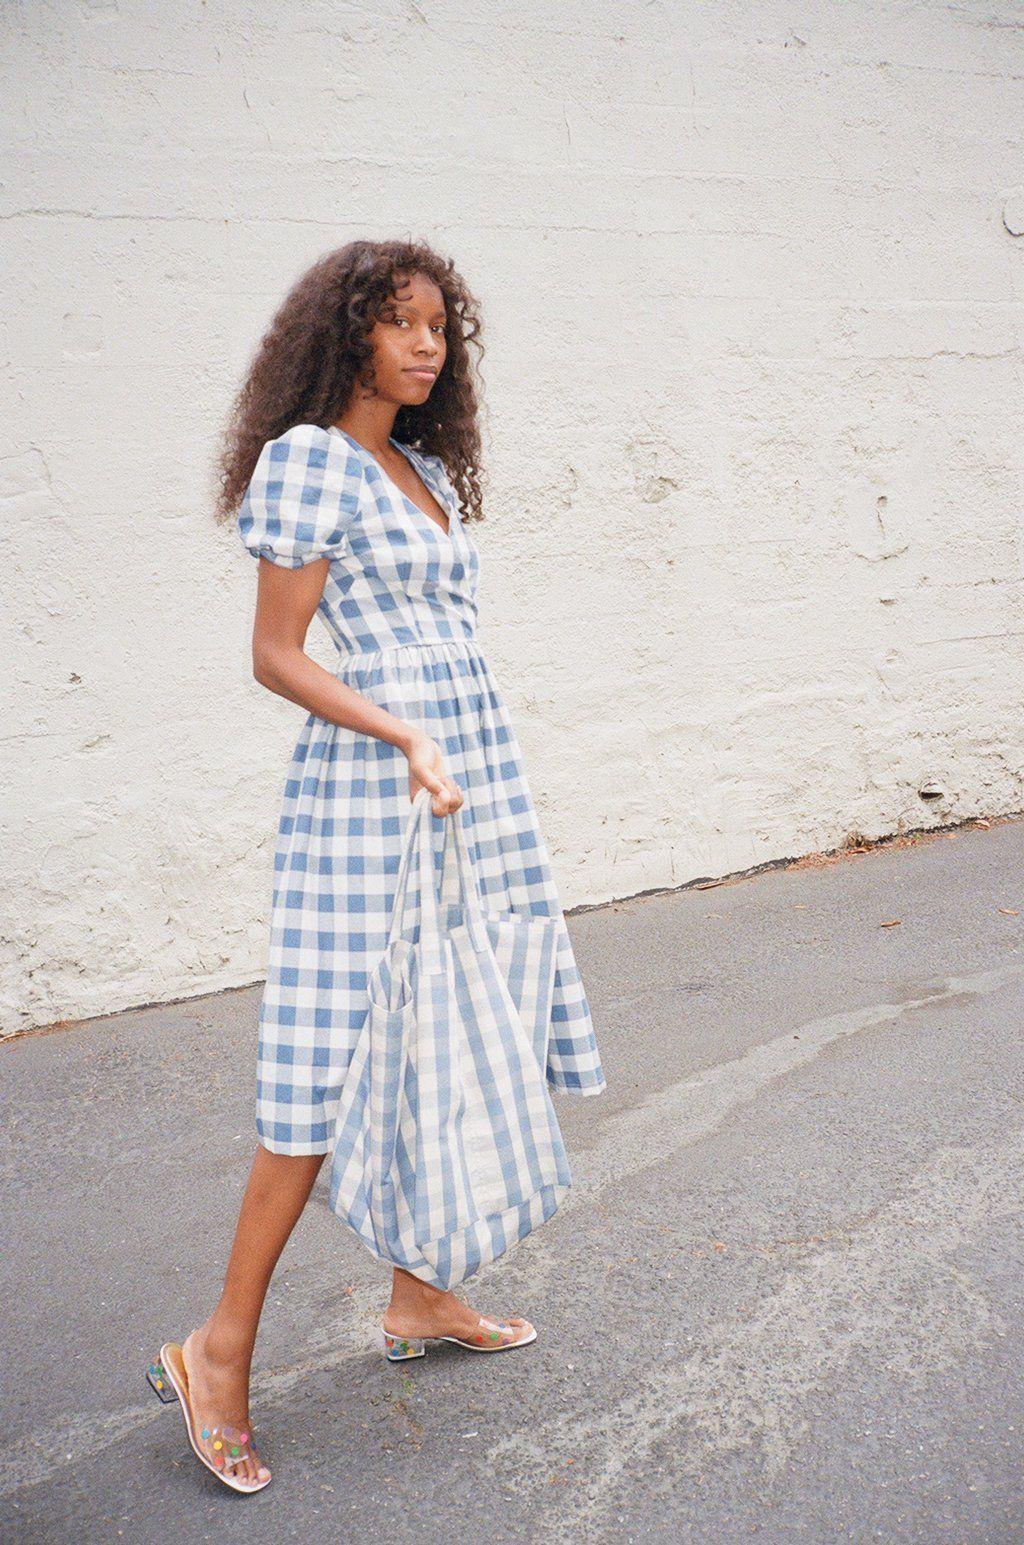 Topanga Midi Dress Denim And Ivory Gingham Dresses Summer Clothes Collection Fashion [ 1545 x 1024 Pixel ]